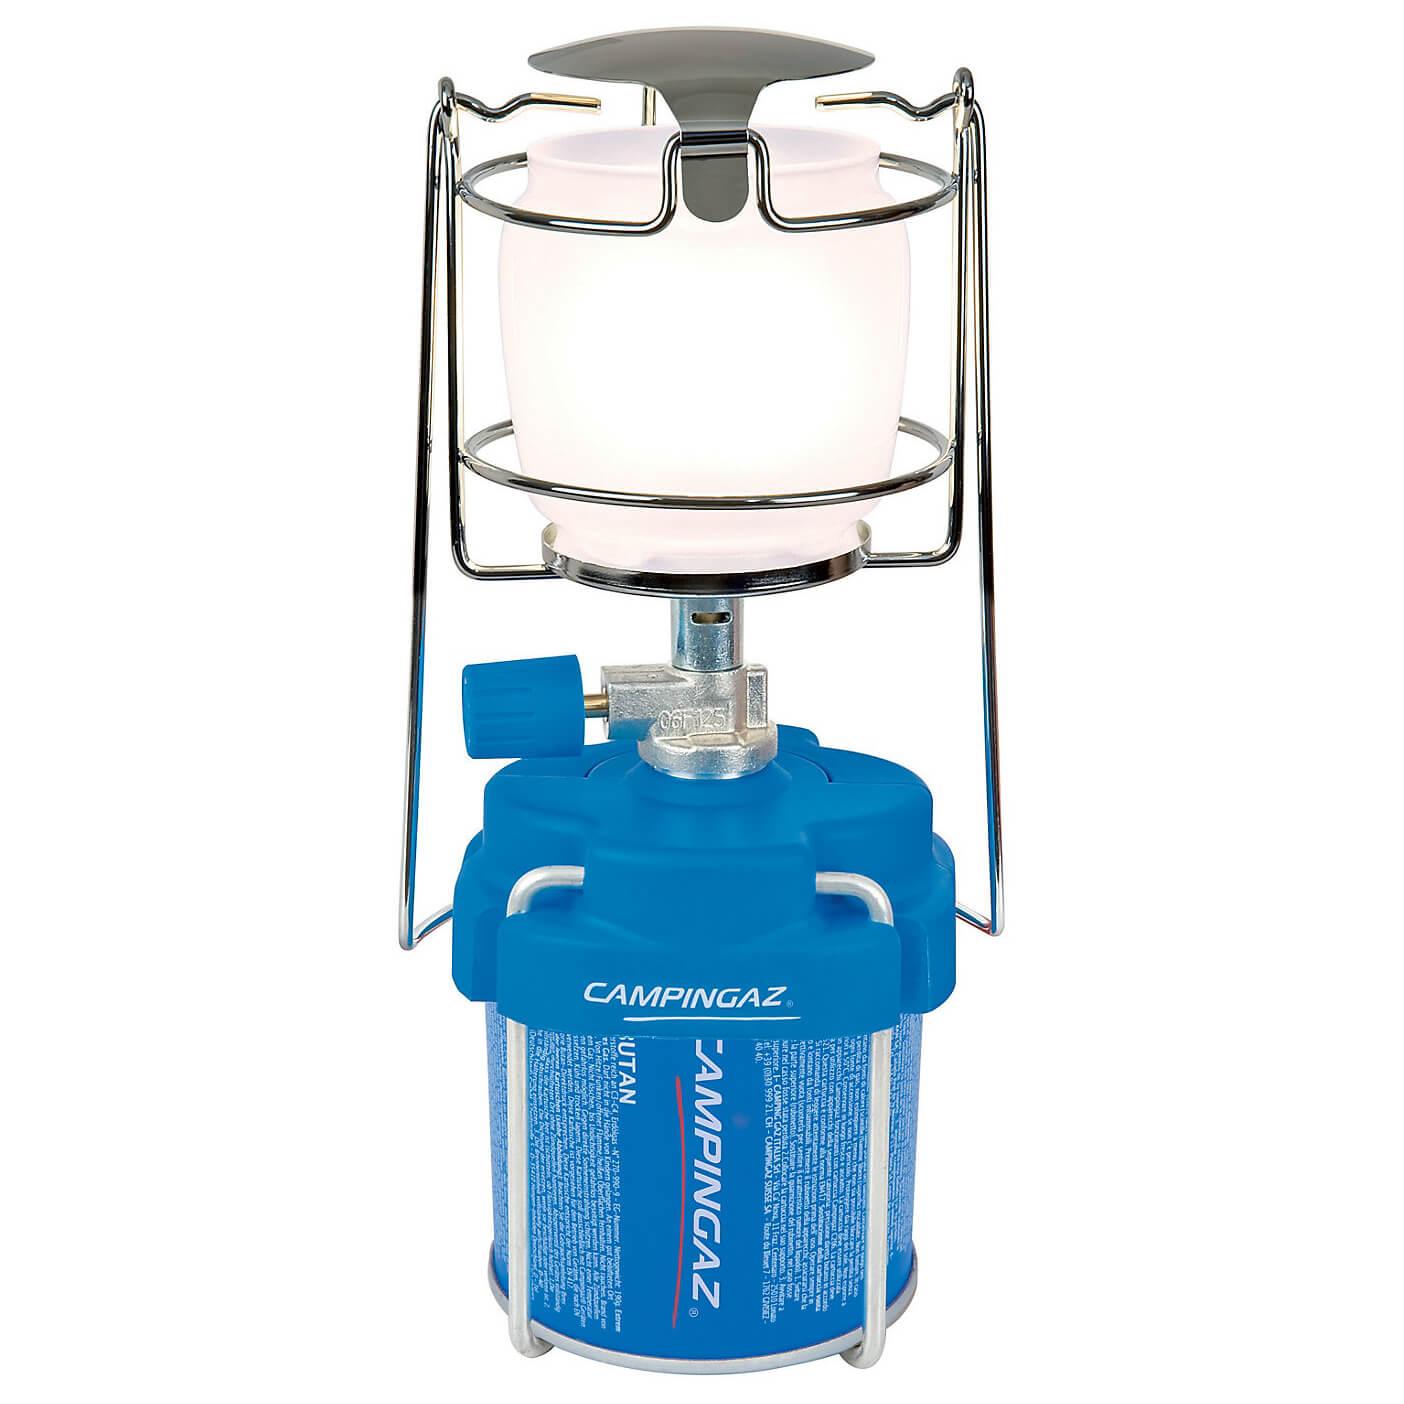 Campingaz Lumo 206 - Gas lantern   Buy online   Bergfreunde.eu